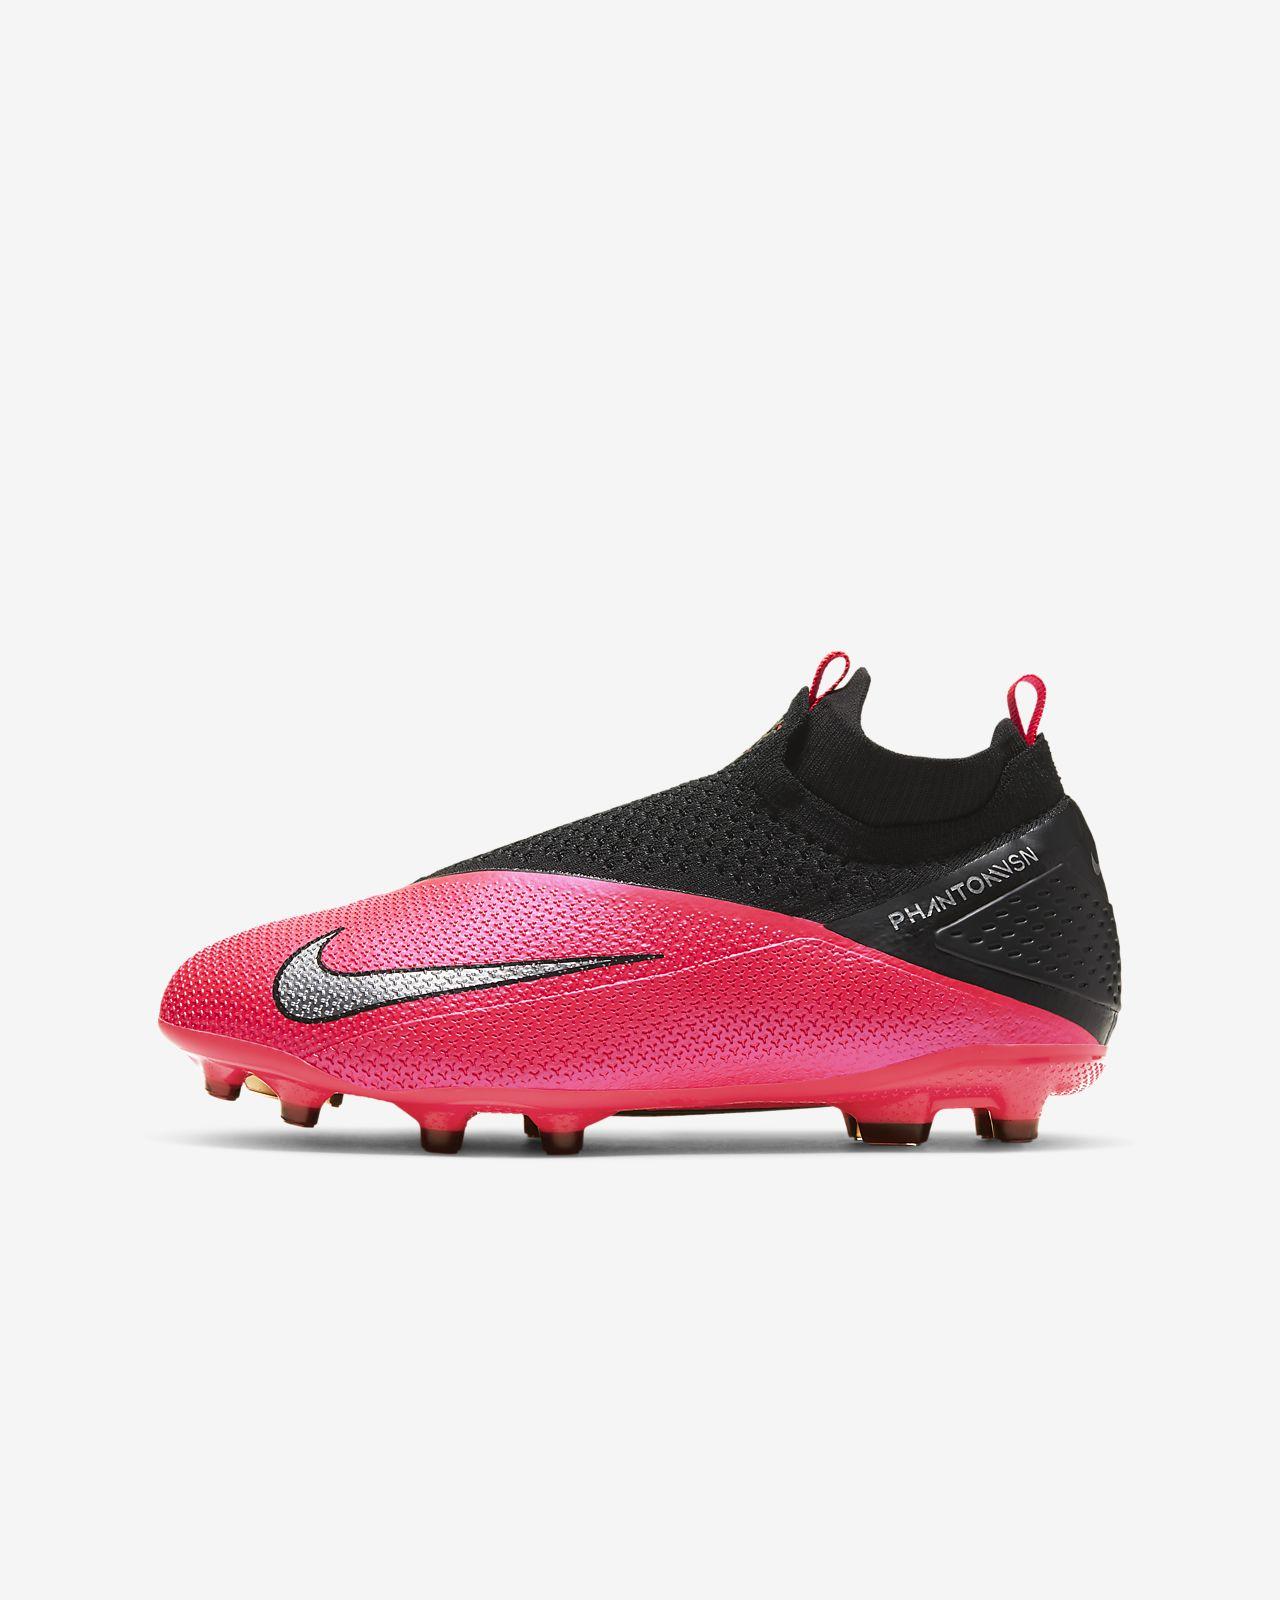 Calzado de fútbol para múltiples superficies para niños talla grande Nike Jr. Phantom Vision 2 Elite Dynamic Fit MG